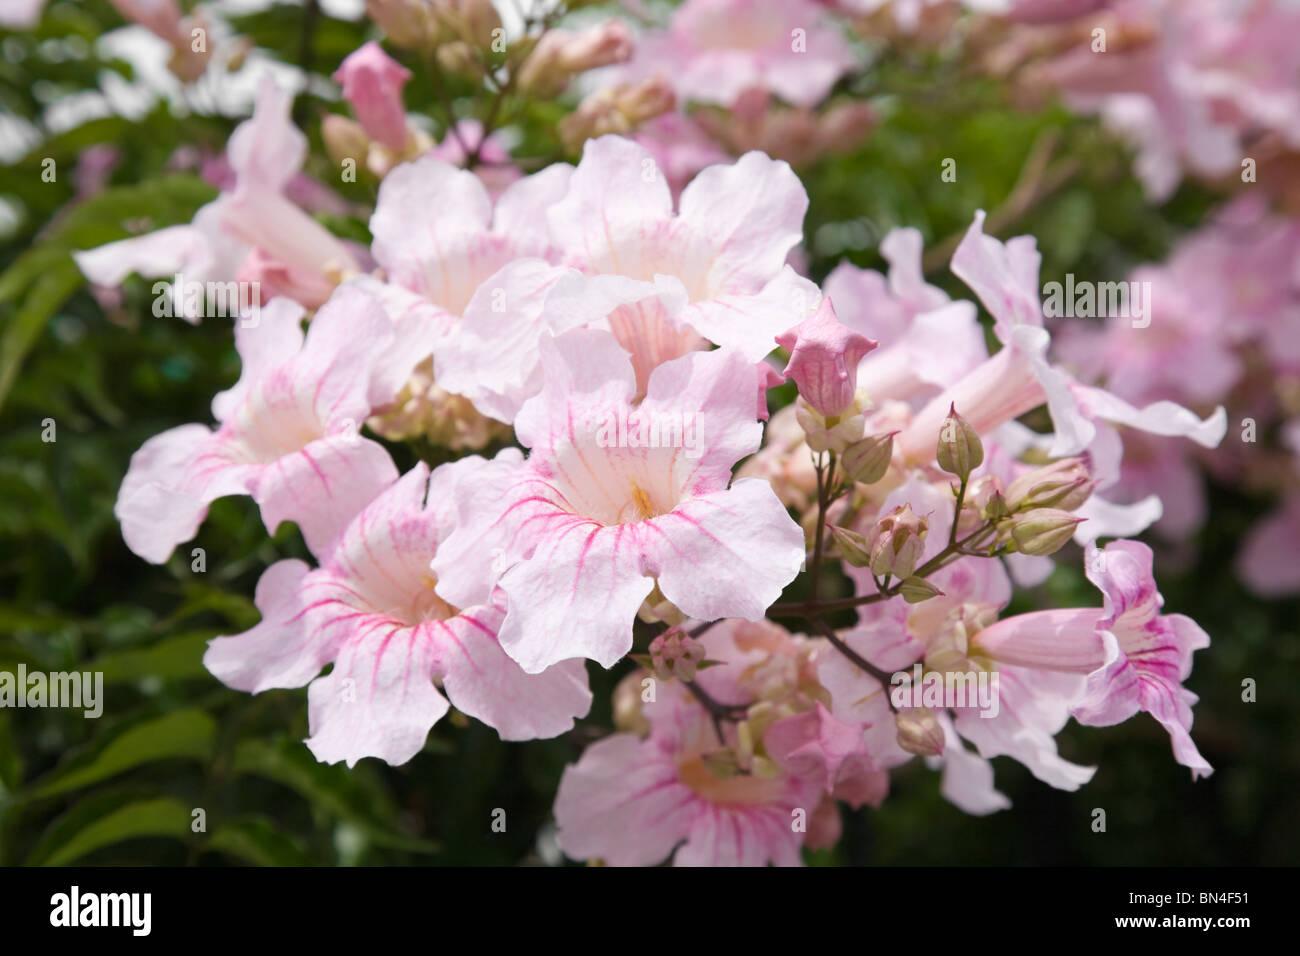 Large flower cluster pink trumpet vine stock photos large flower large flower cluster of pandorea ricasoliana pink tecoma pink trumpet vine port st mightylinksfo